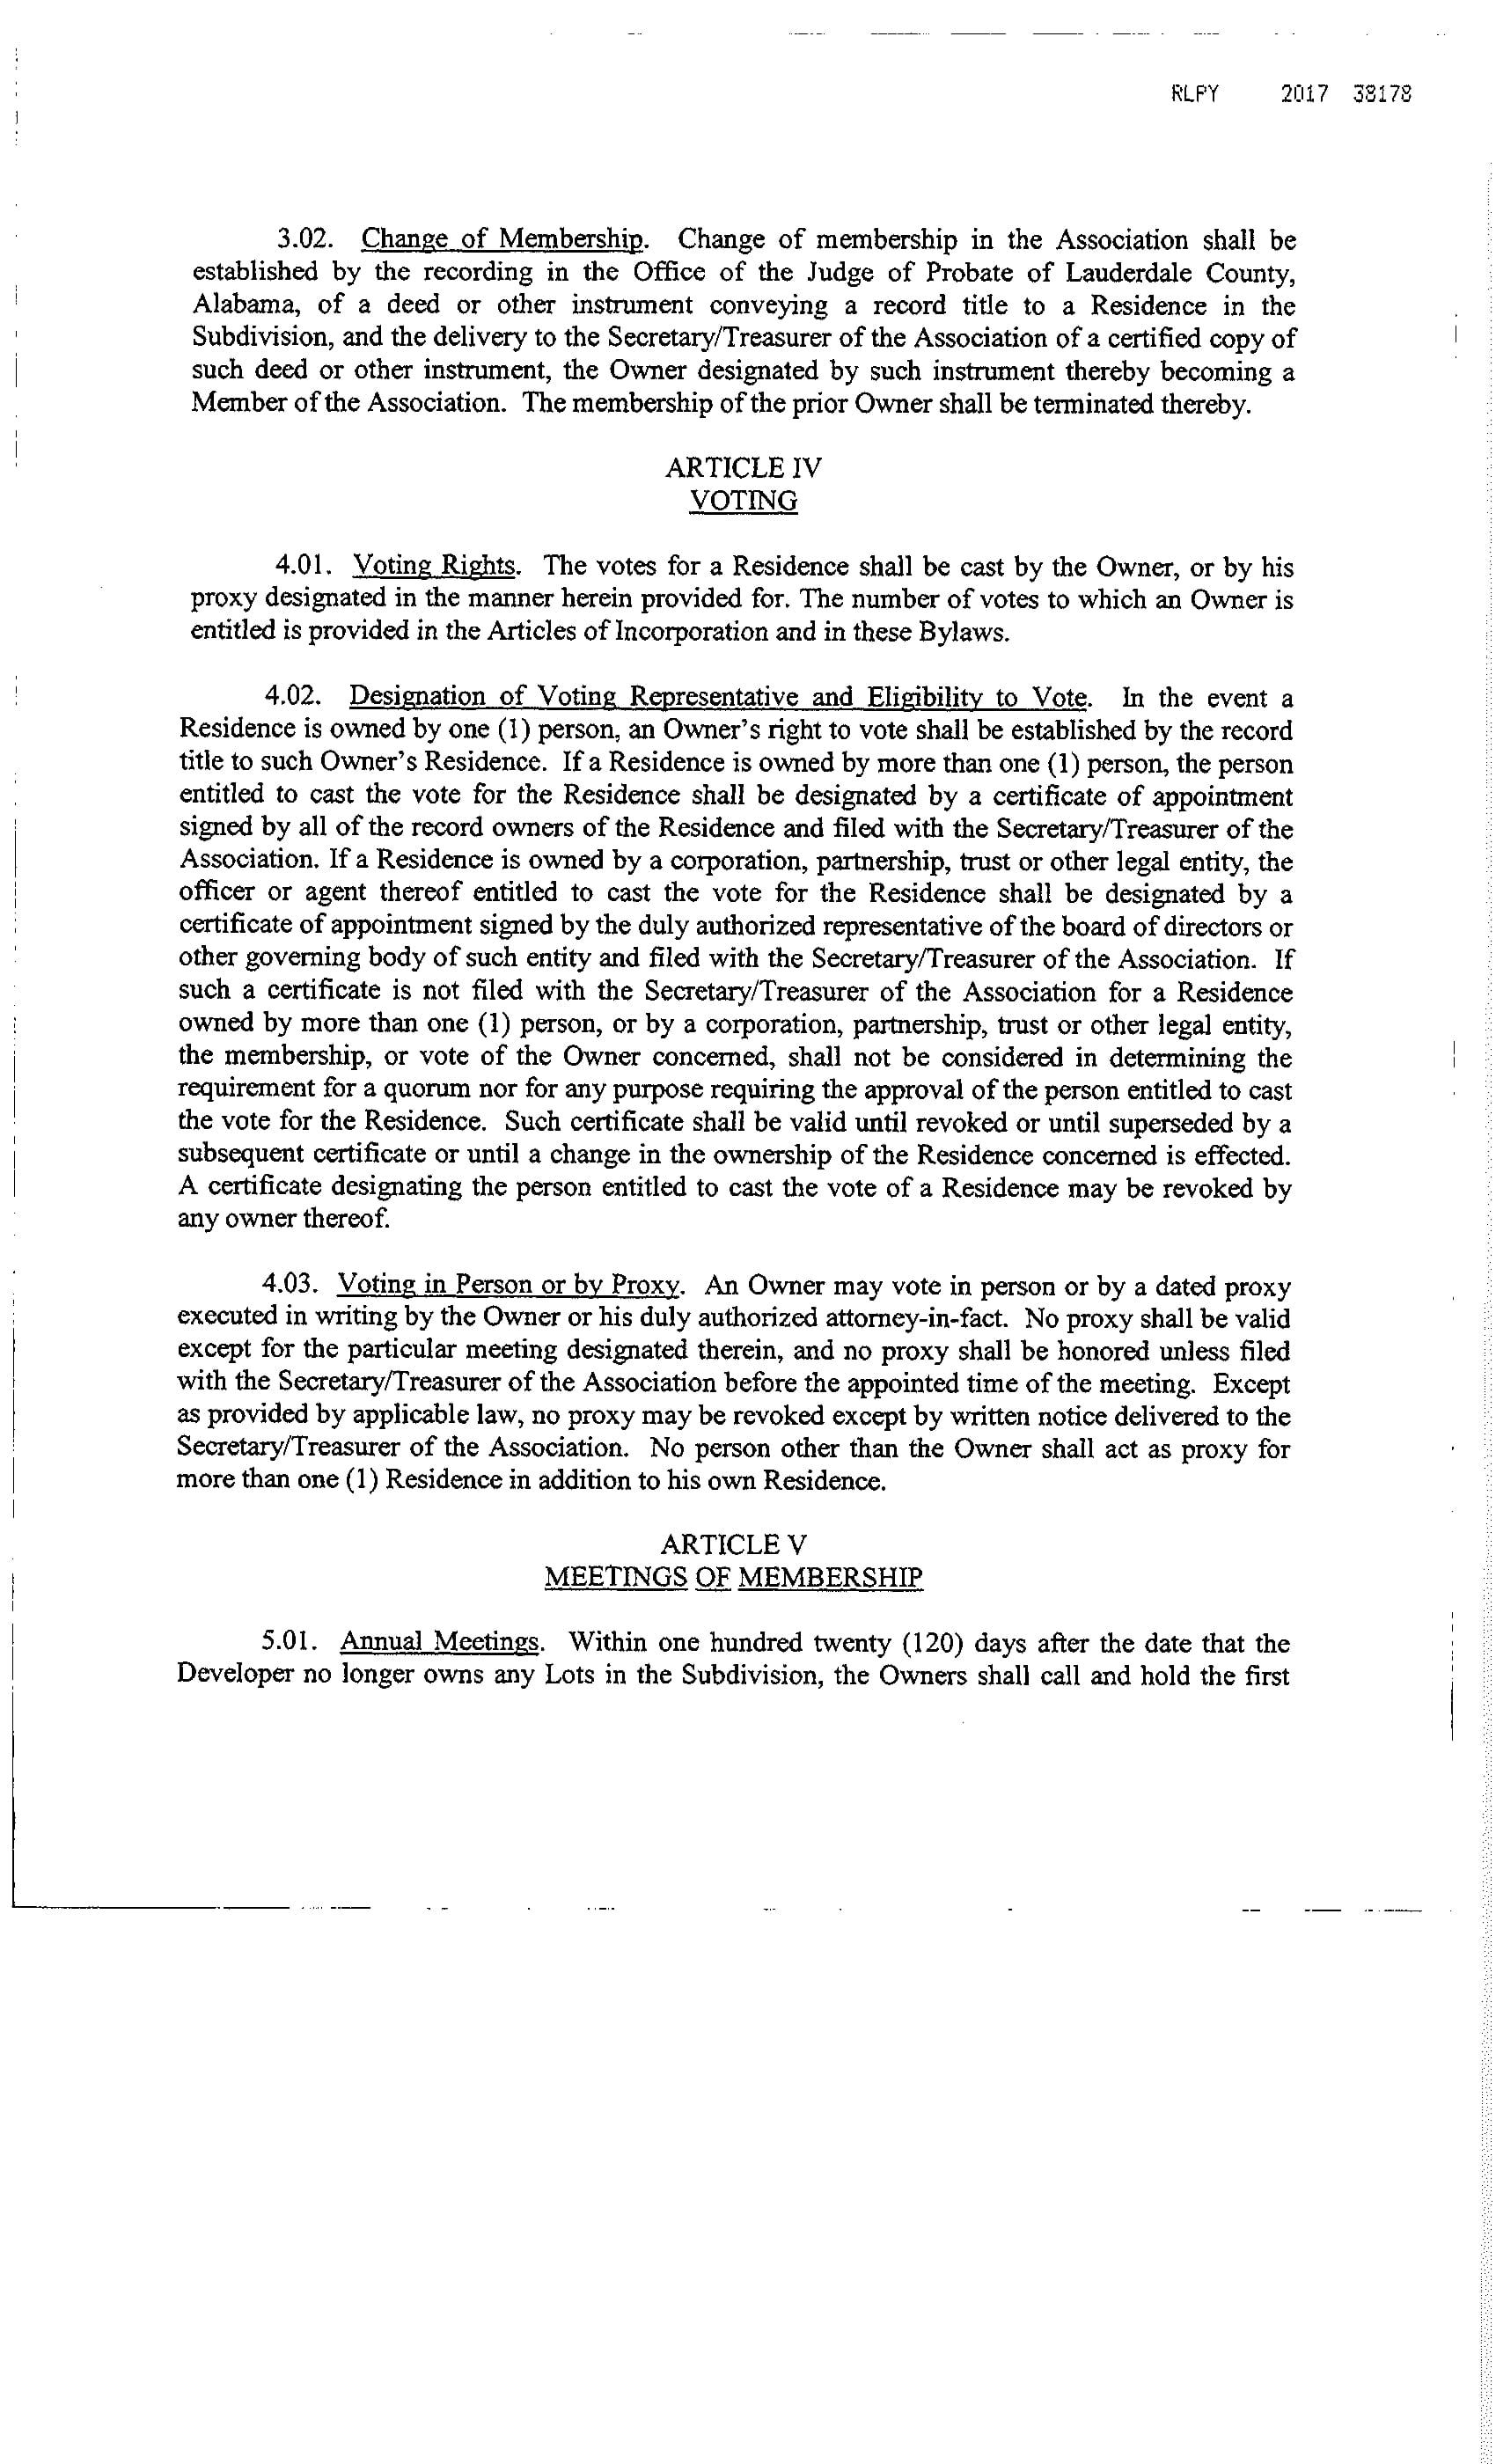 Covenants-Pine-Ridge-Subdivision-1-69.jpg